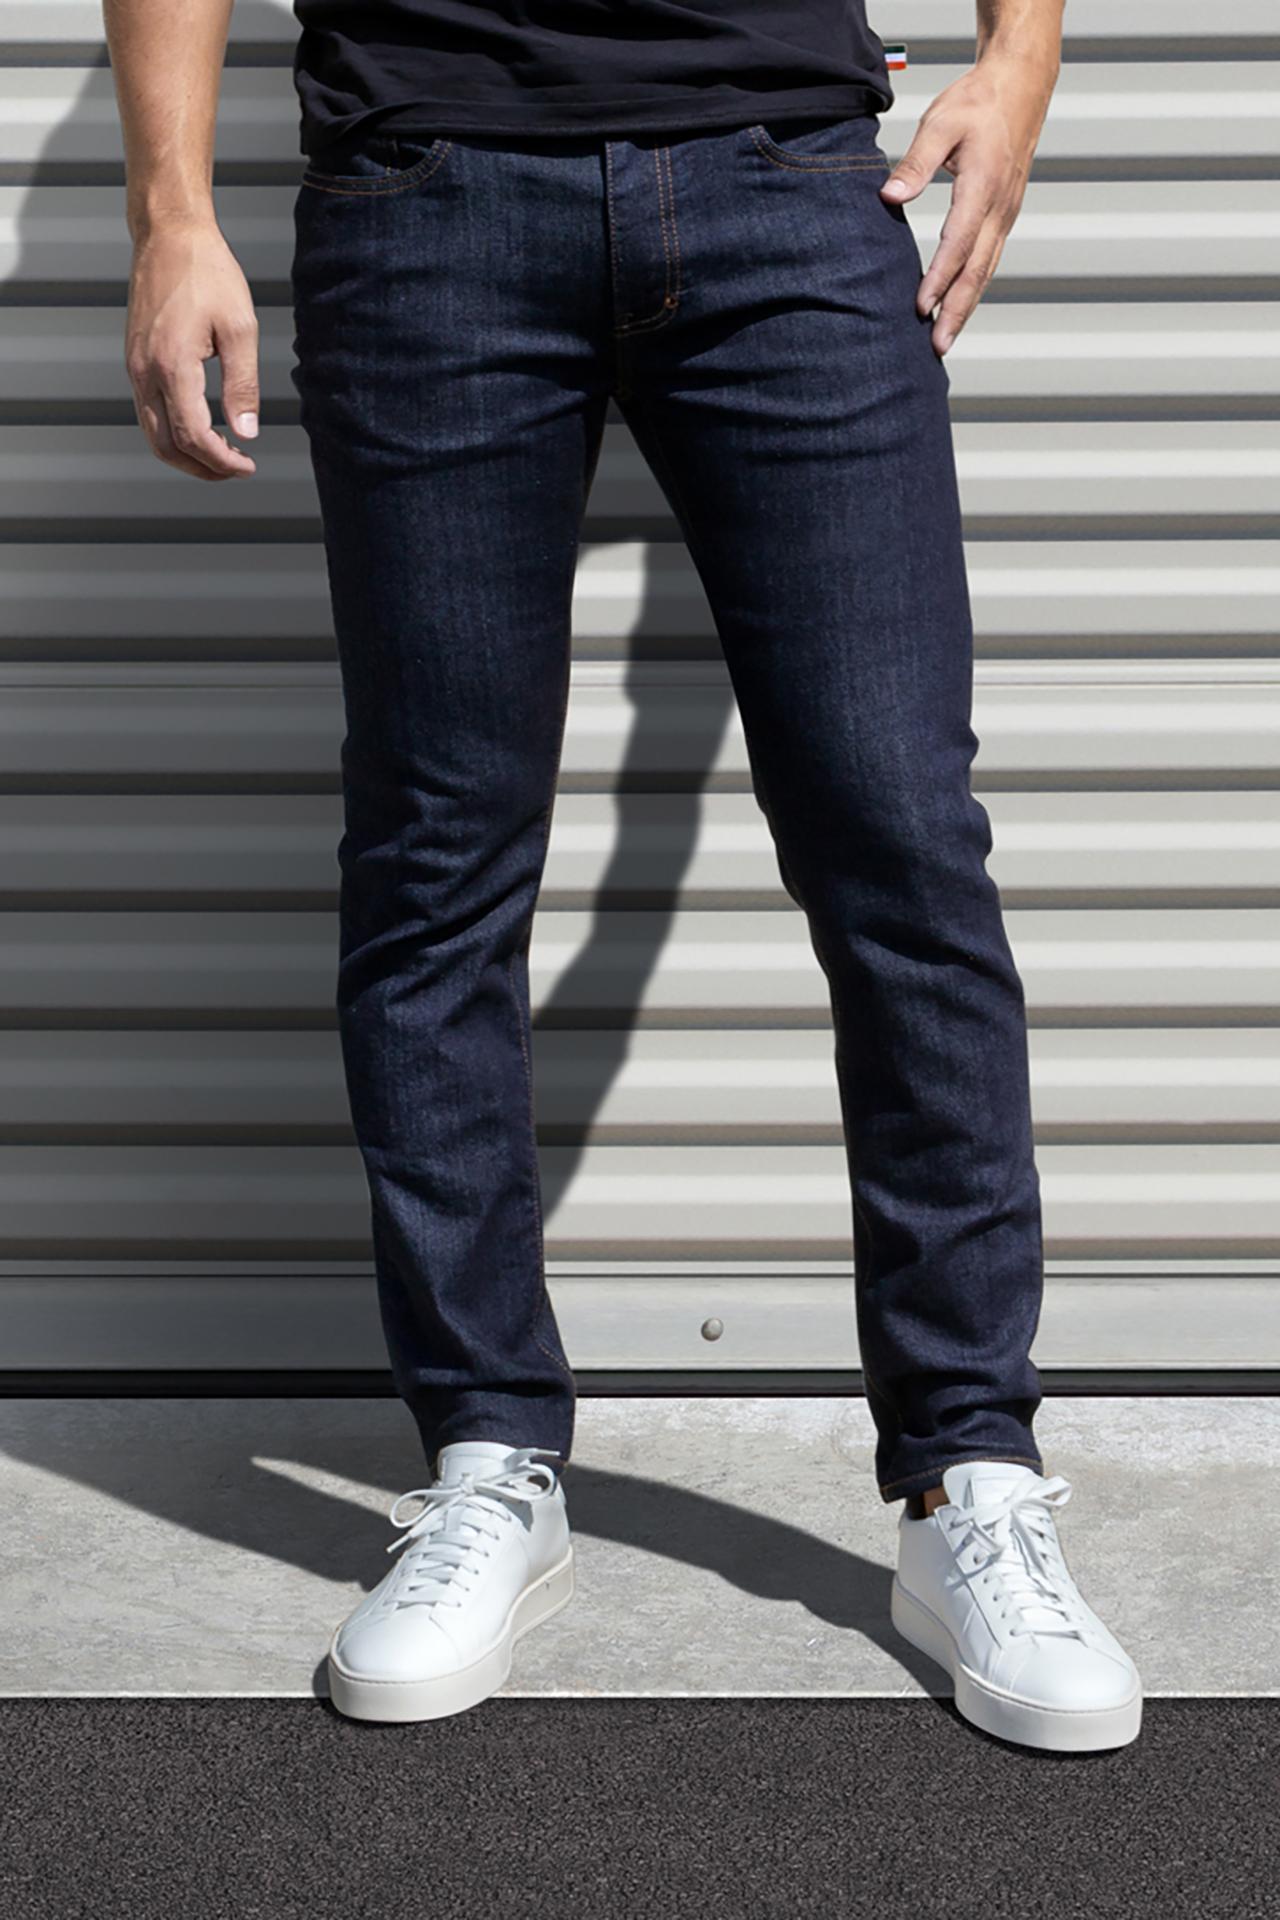 AM X PRPS Stretch Denim Jeans in Raw Indigo